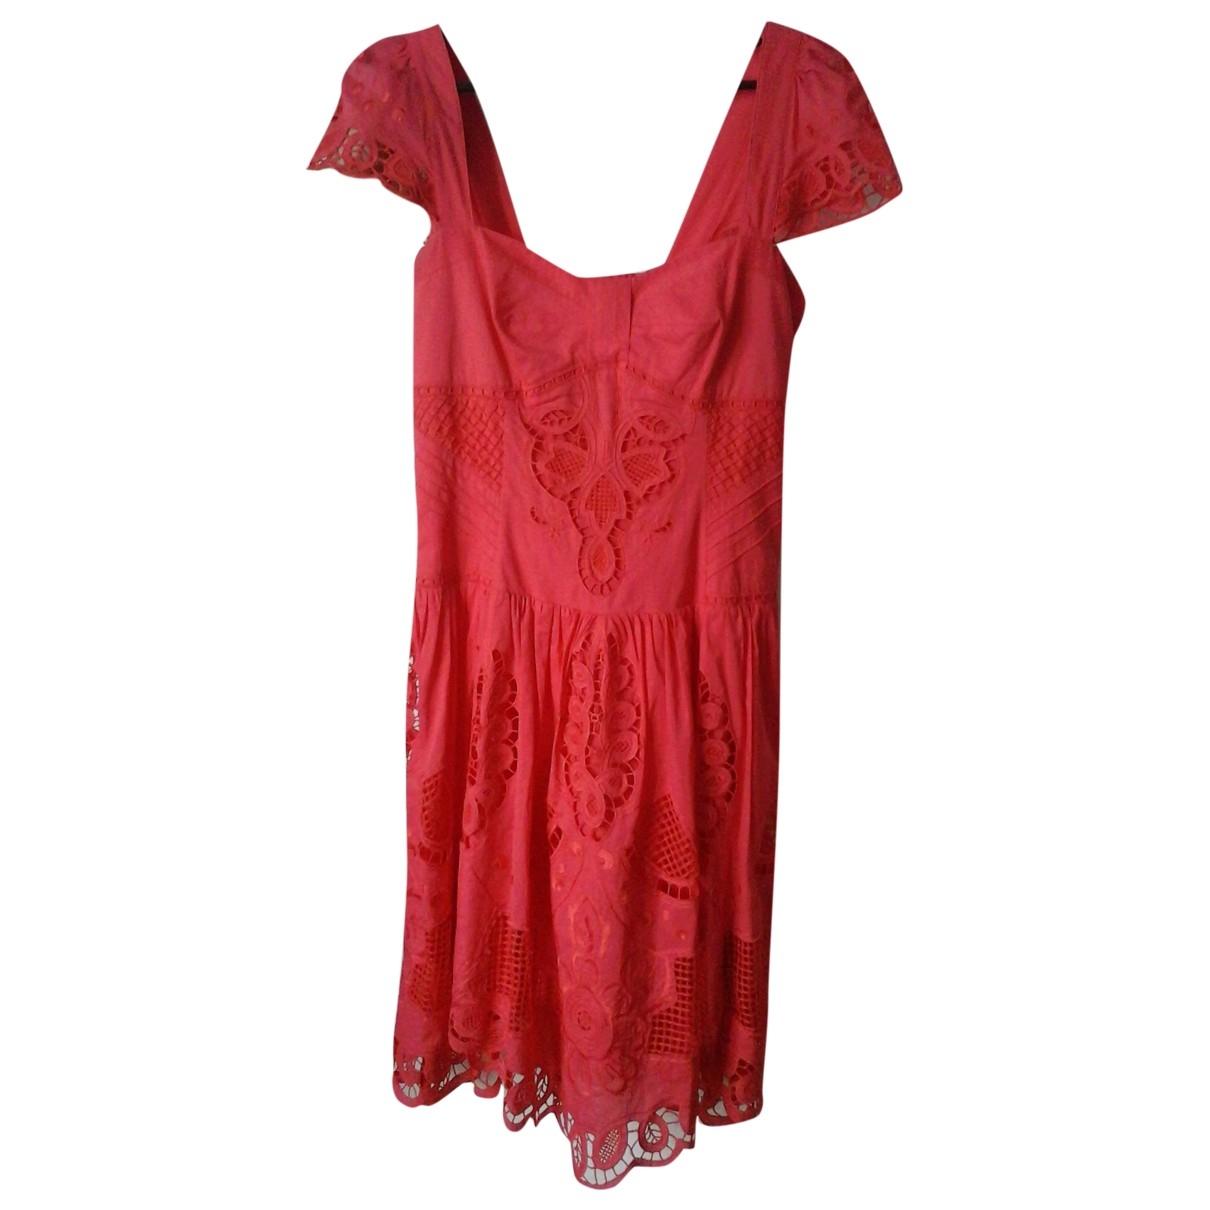 Karen Millen \N Kleid in Baumwolle